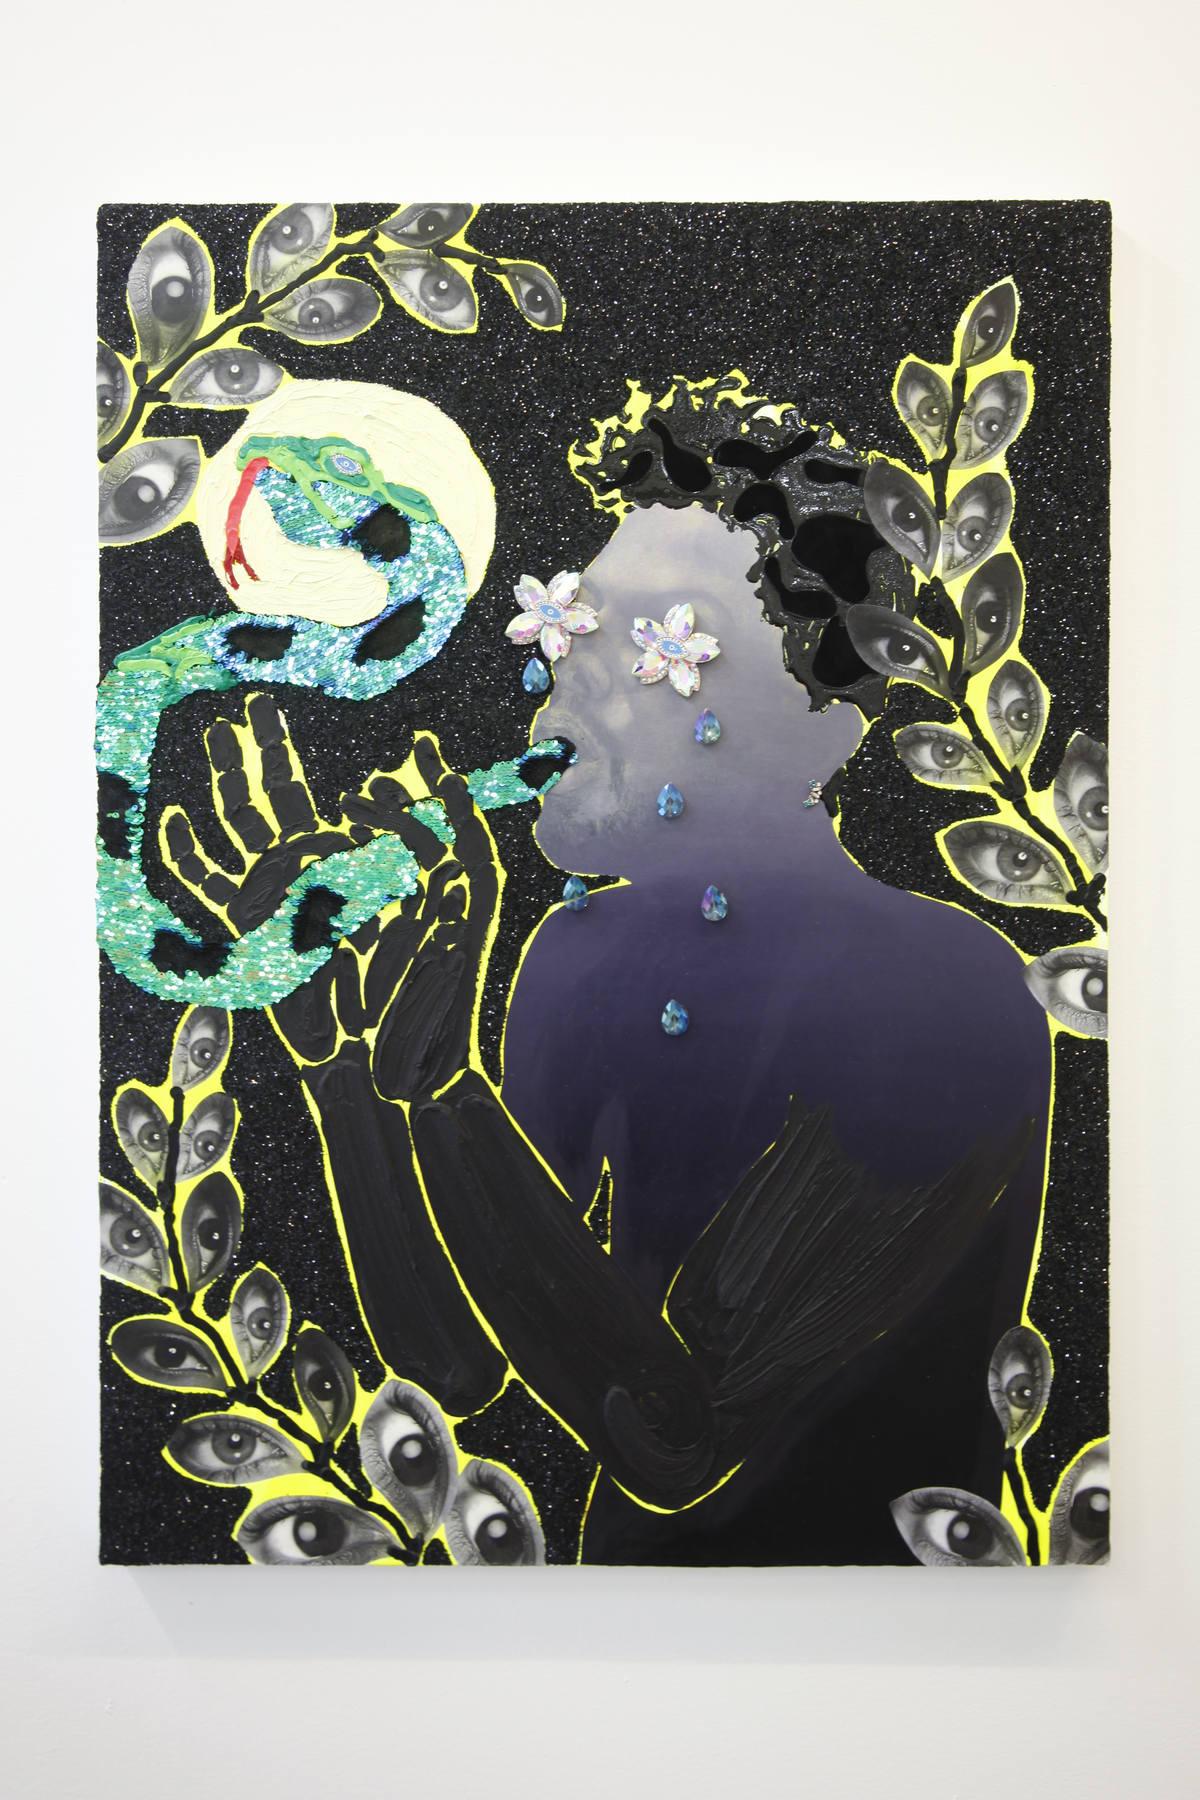 Devan Shimoyama at Stems Gallery 02